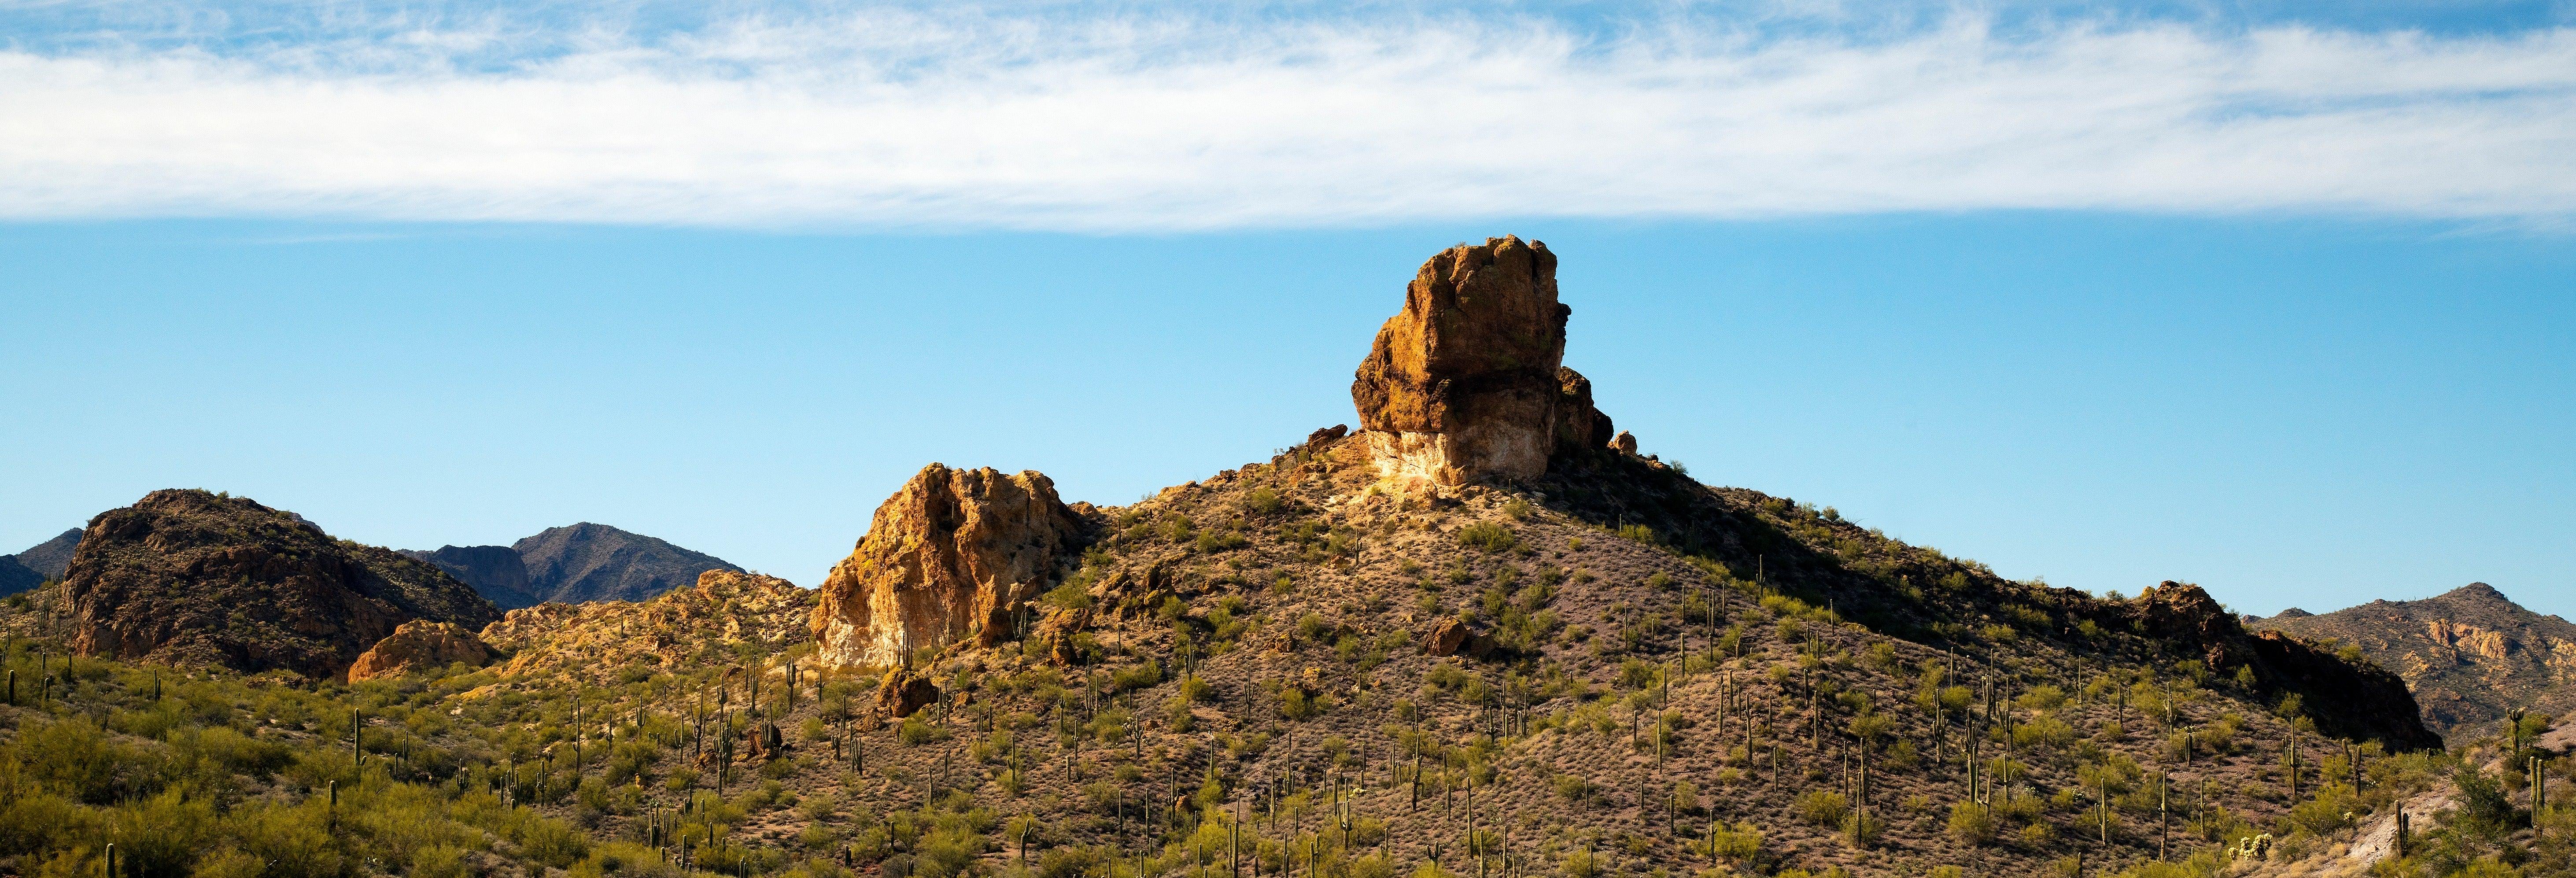 Quad Biking in the Sonoran Desert